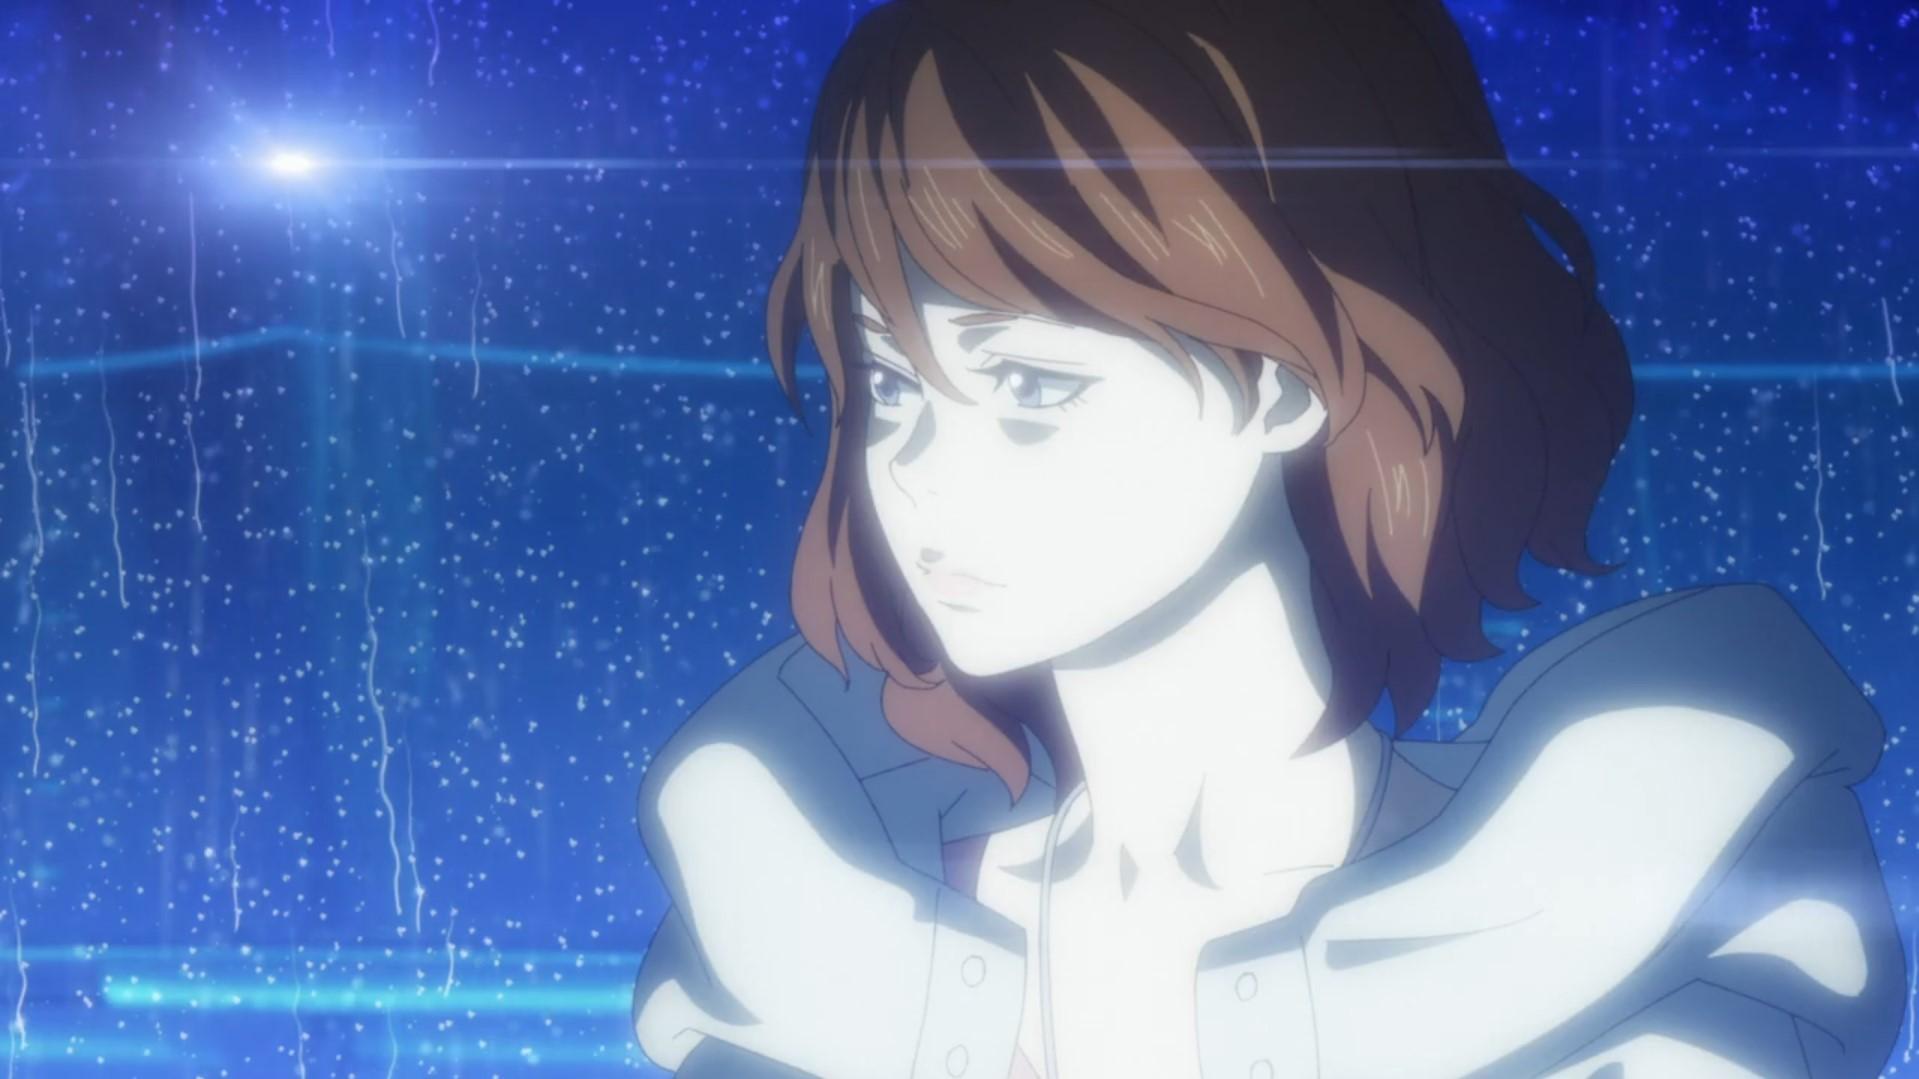 Psycho Pass 3 Komiya Karina